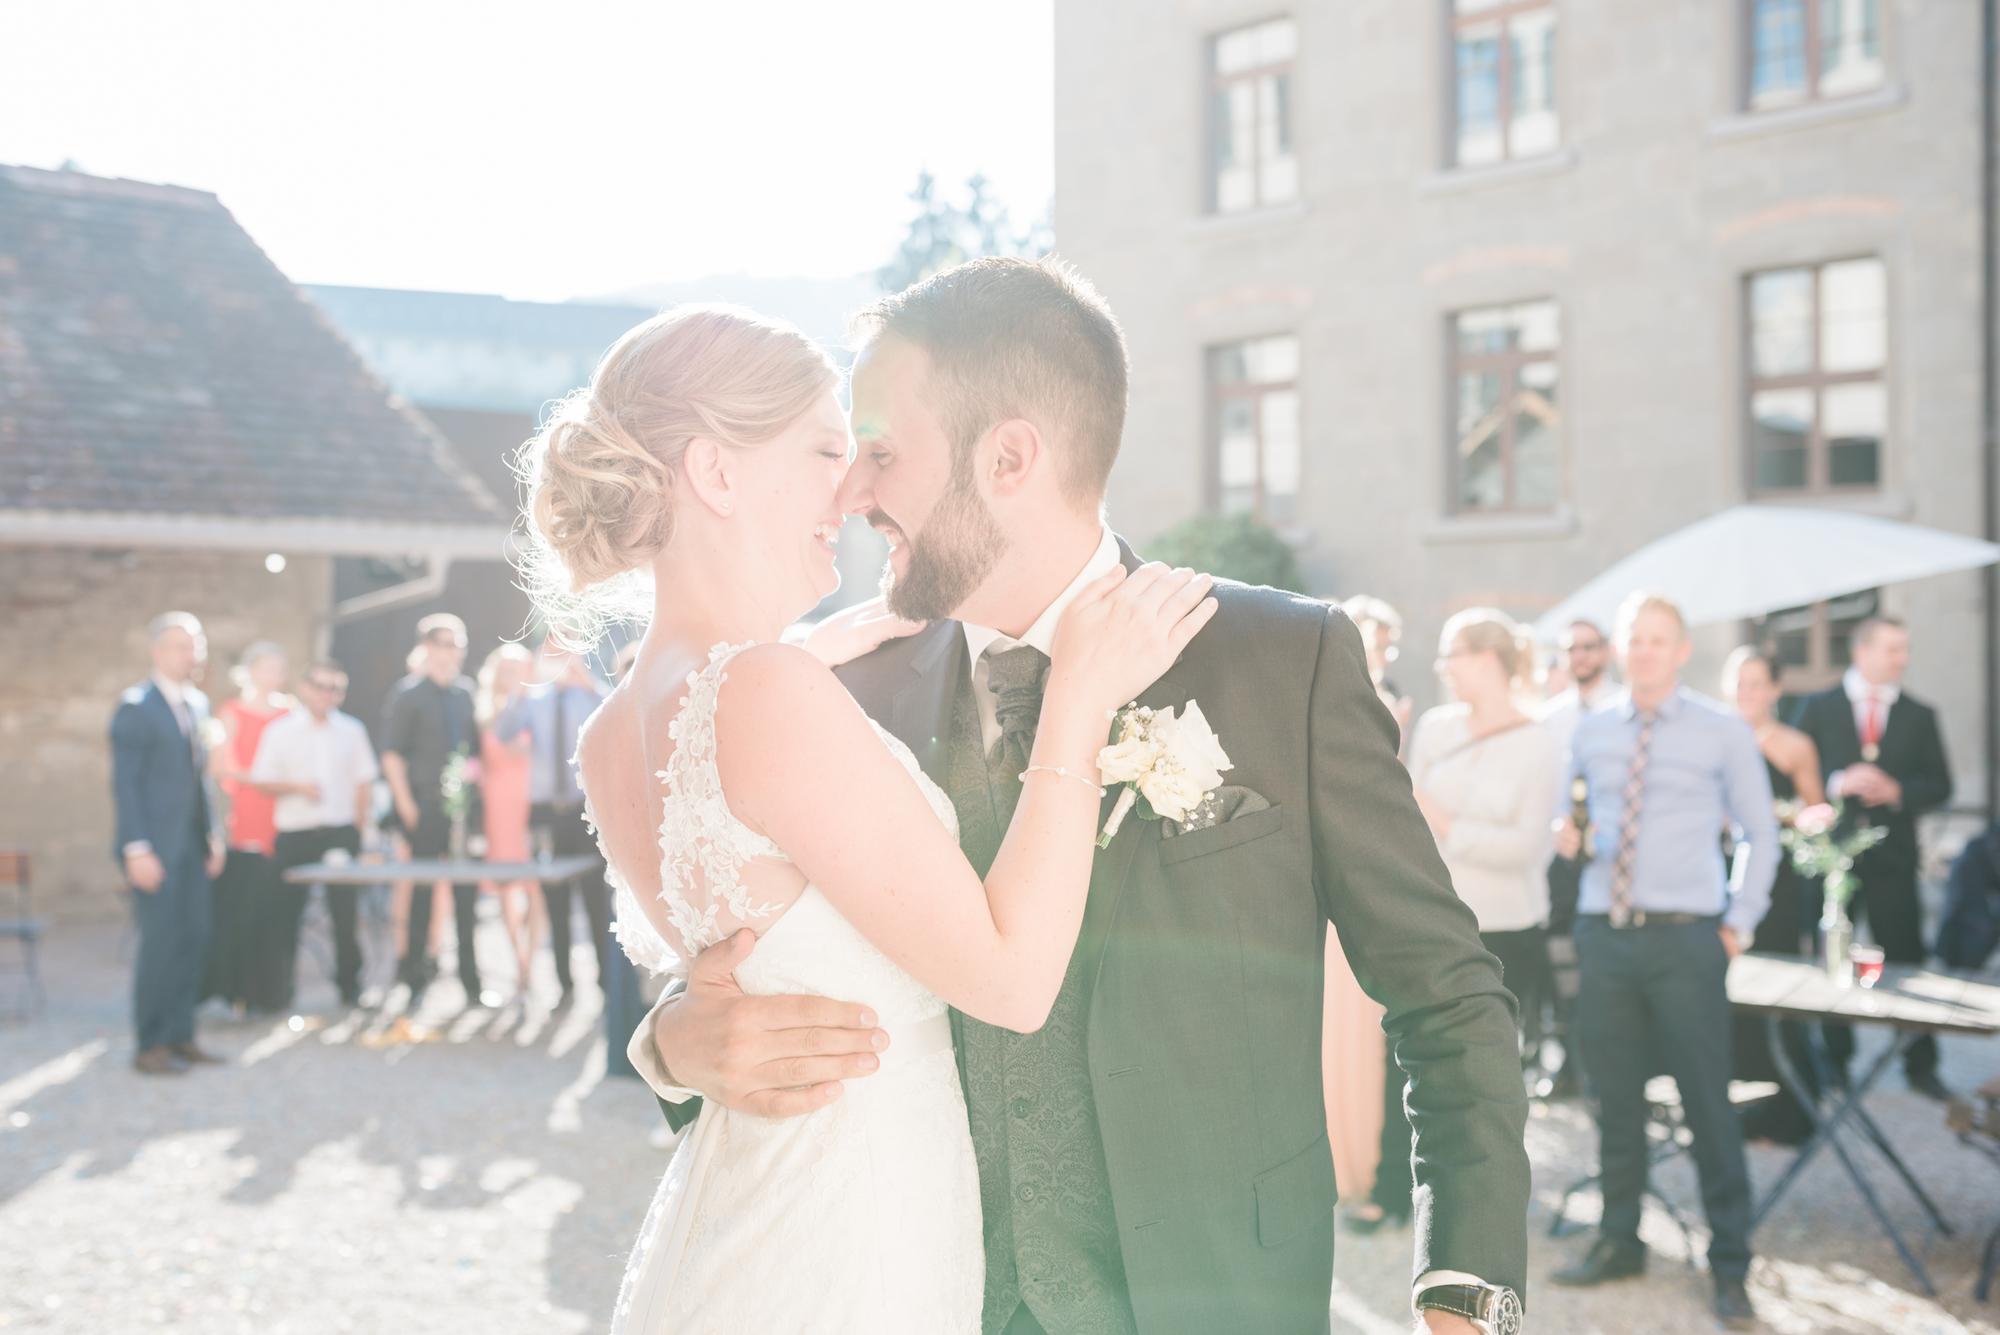 NadiaundMichael_Hochzeit_BekaBitterliFotografie_752.jpg